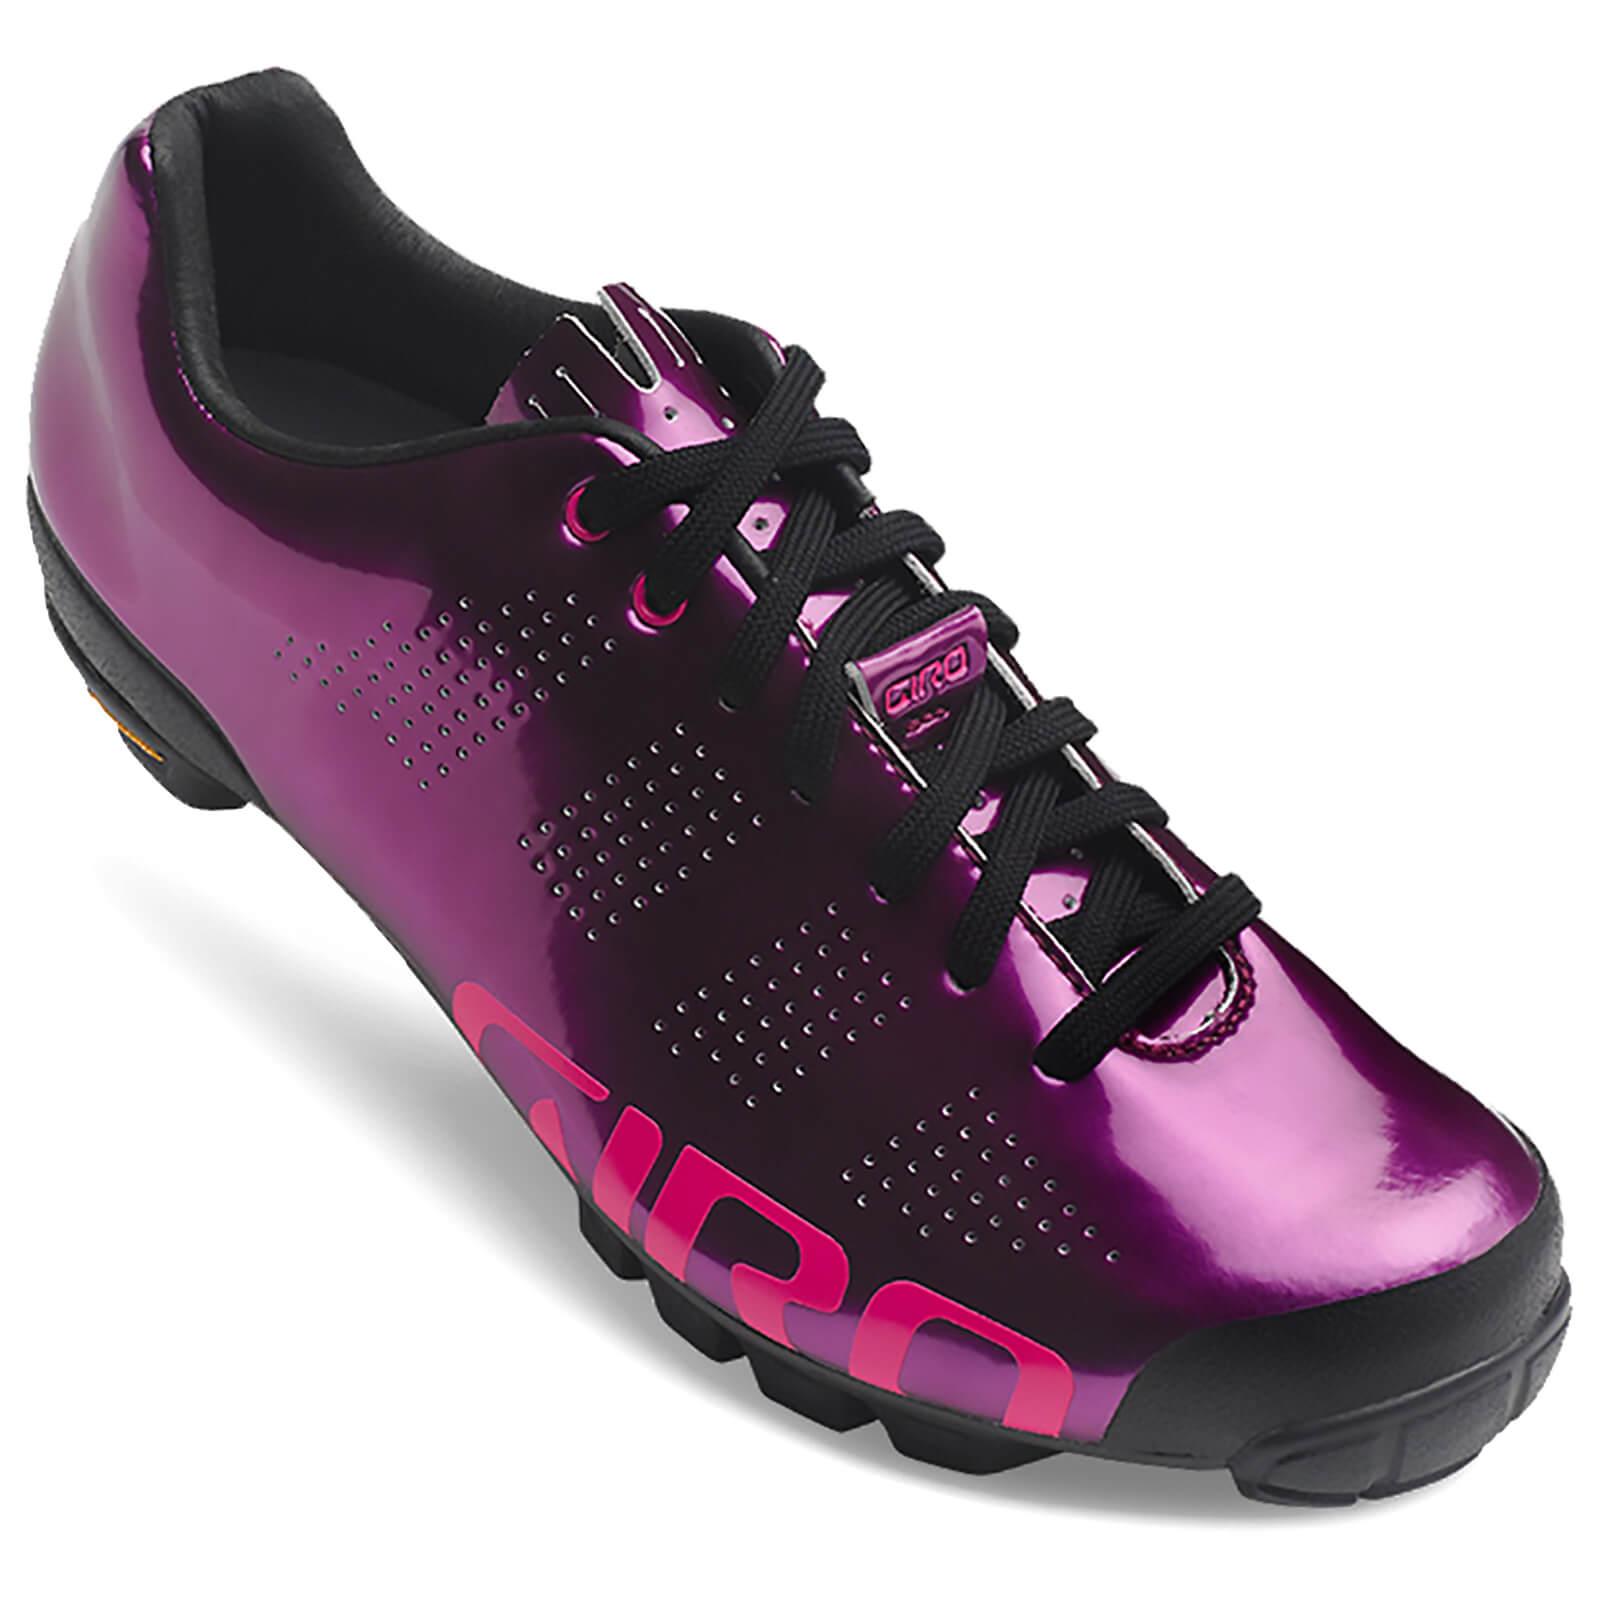 Giro VR90 Women's MTB Cycling Shoes - Berry/Bright Pink - EU 37/UK 4 - Red